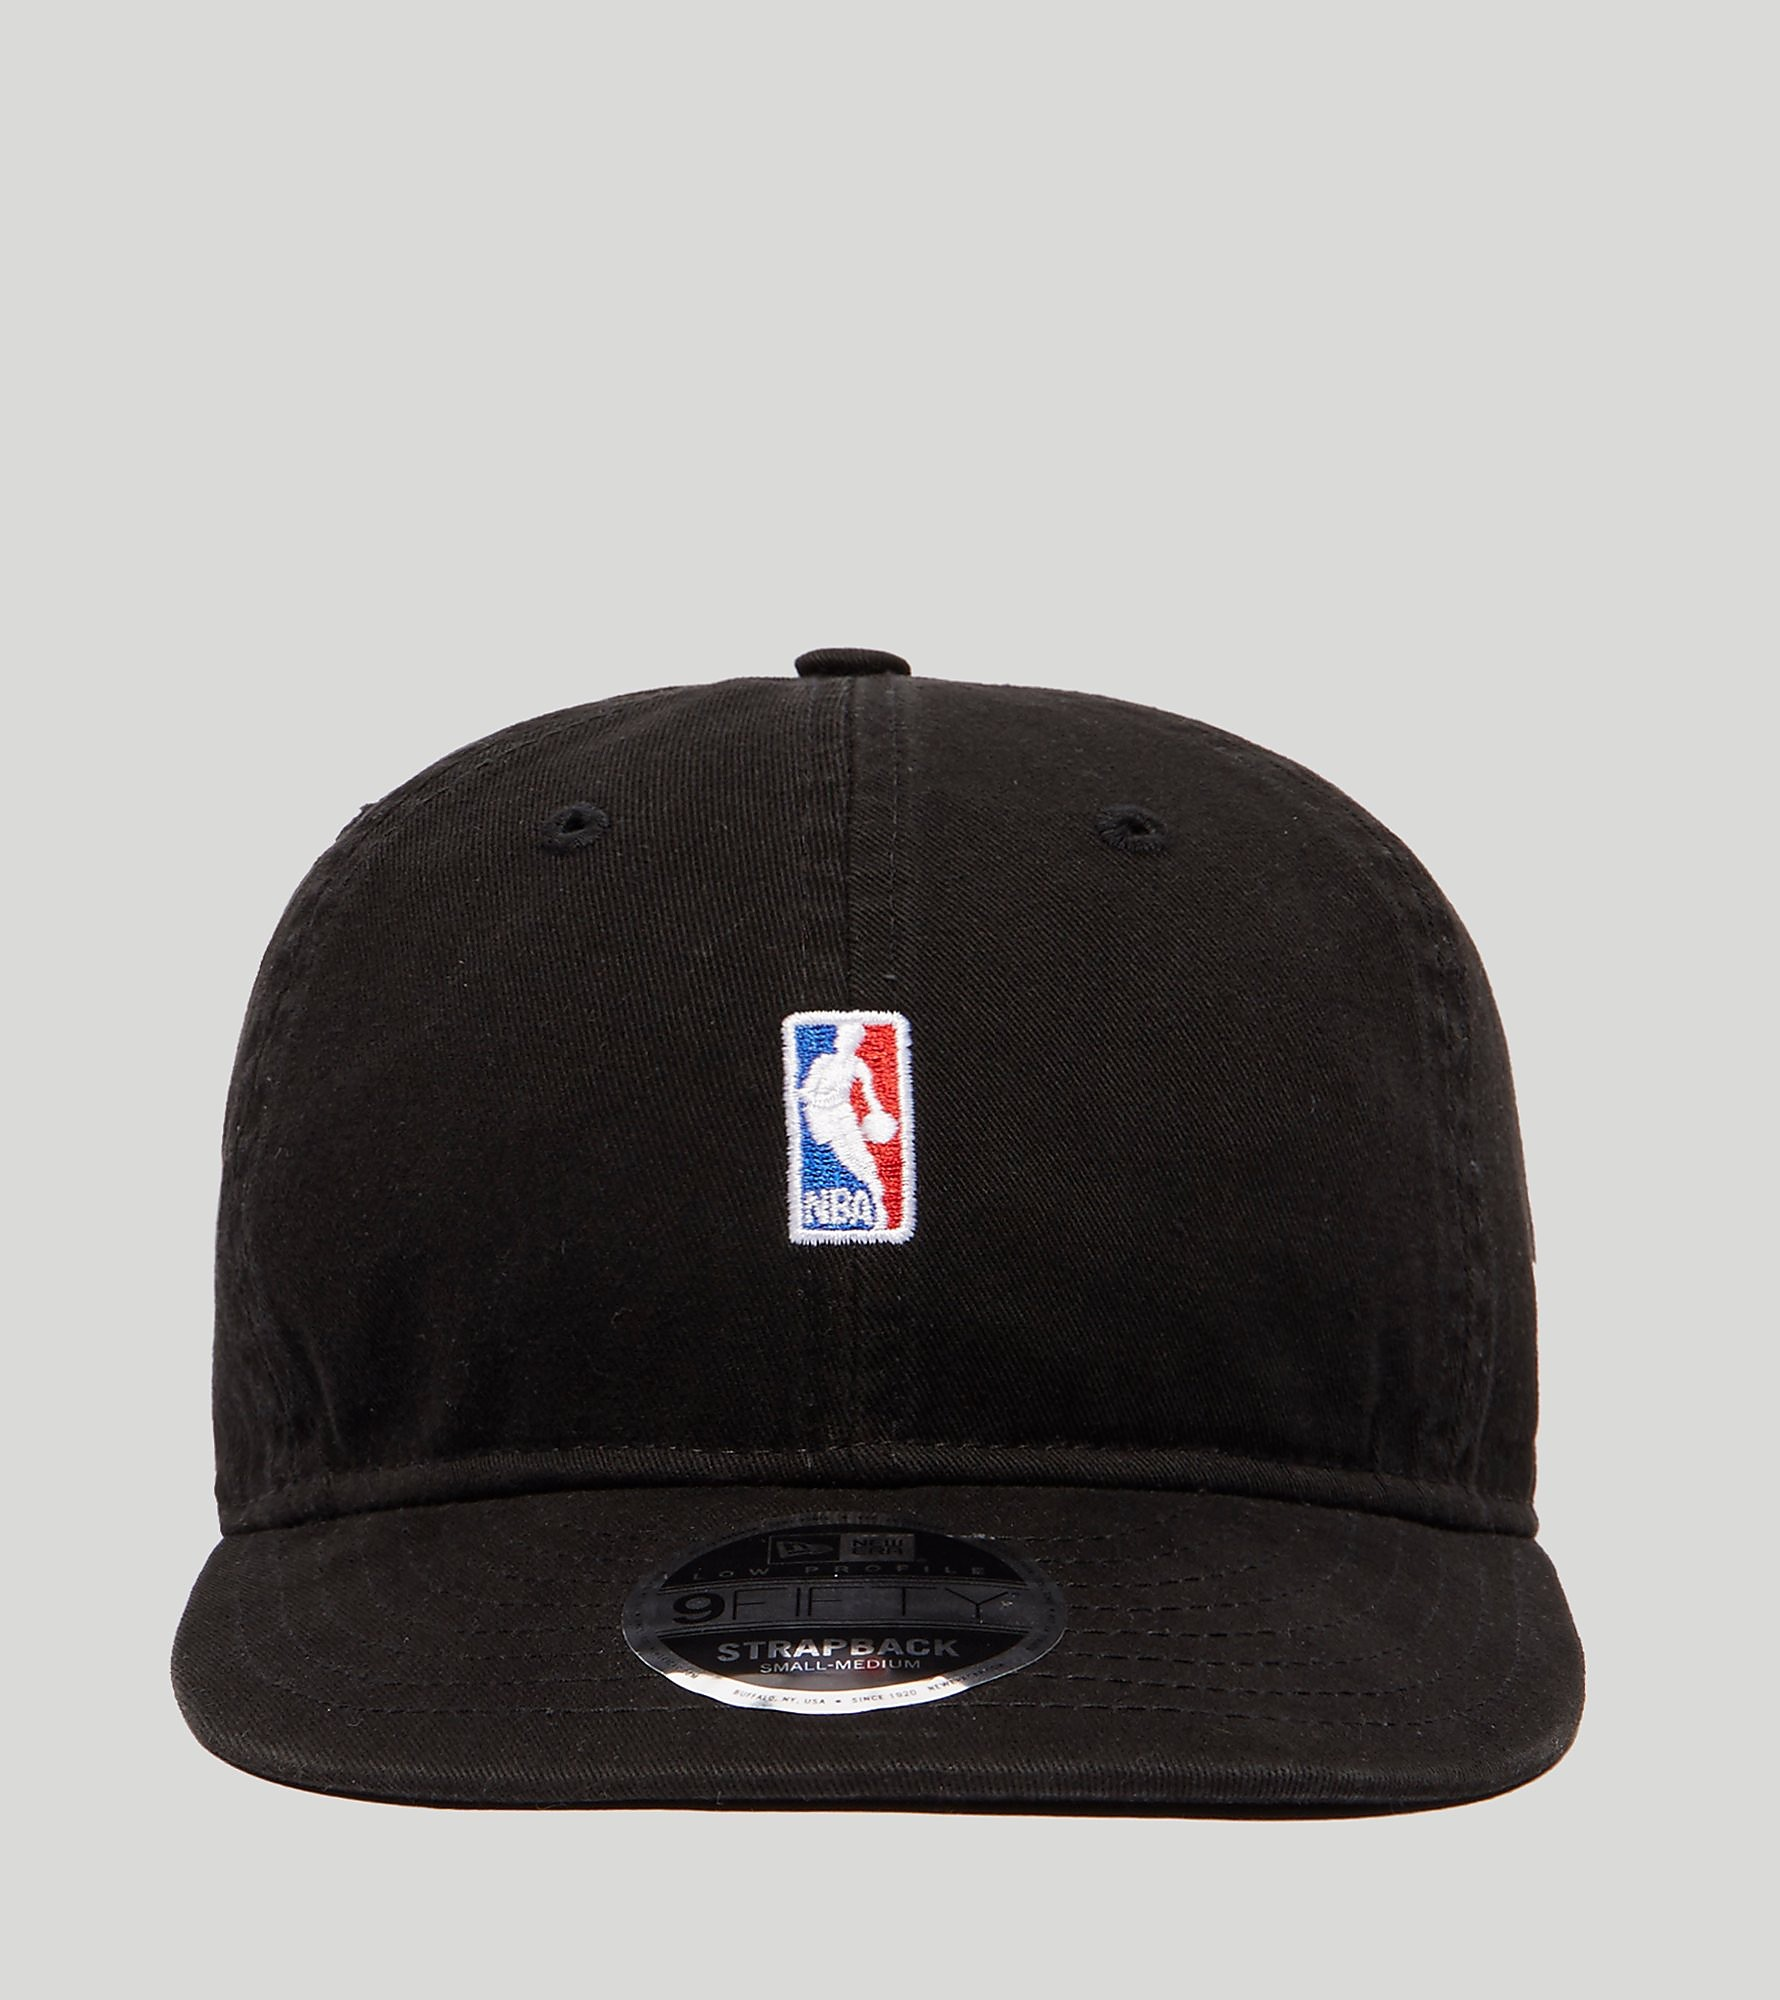 New Era 9FIFTY Low NBA Logo Cap